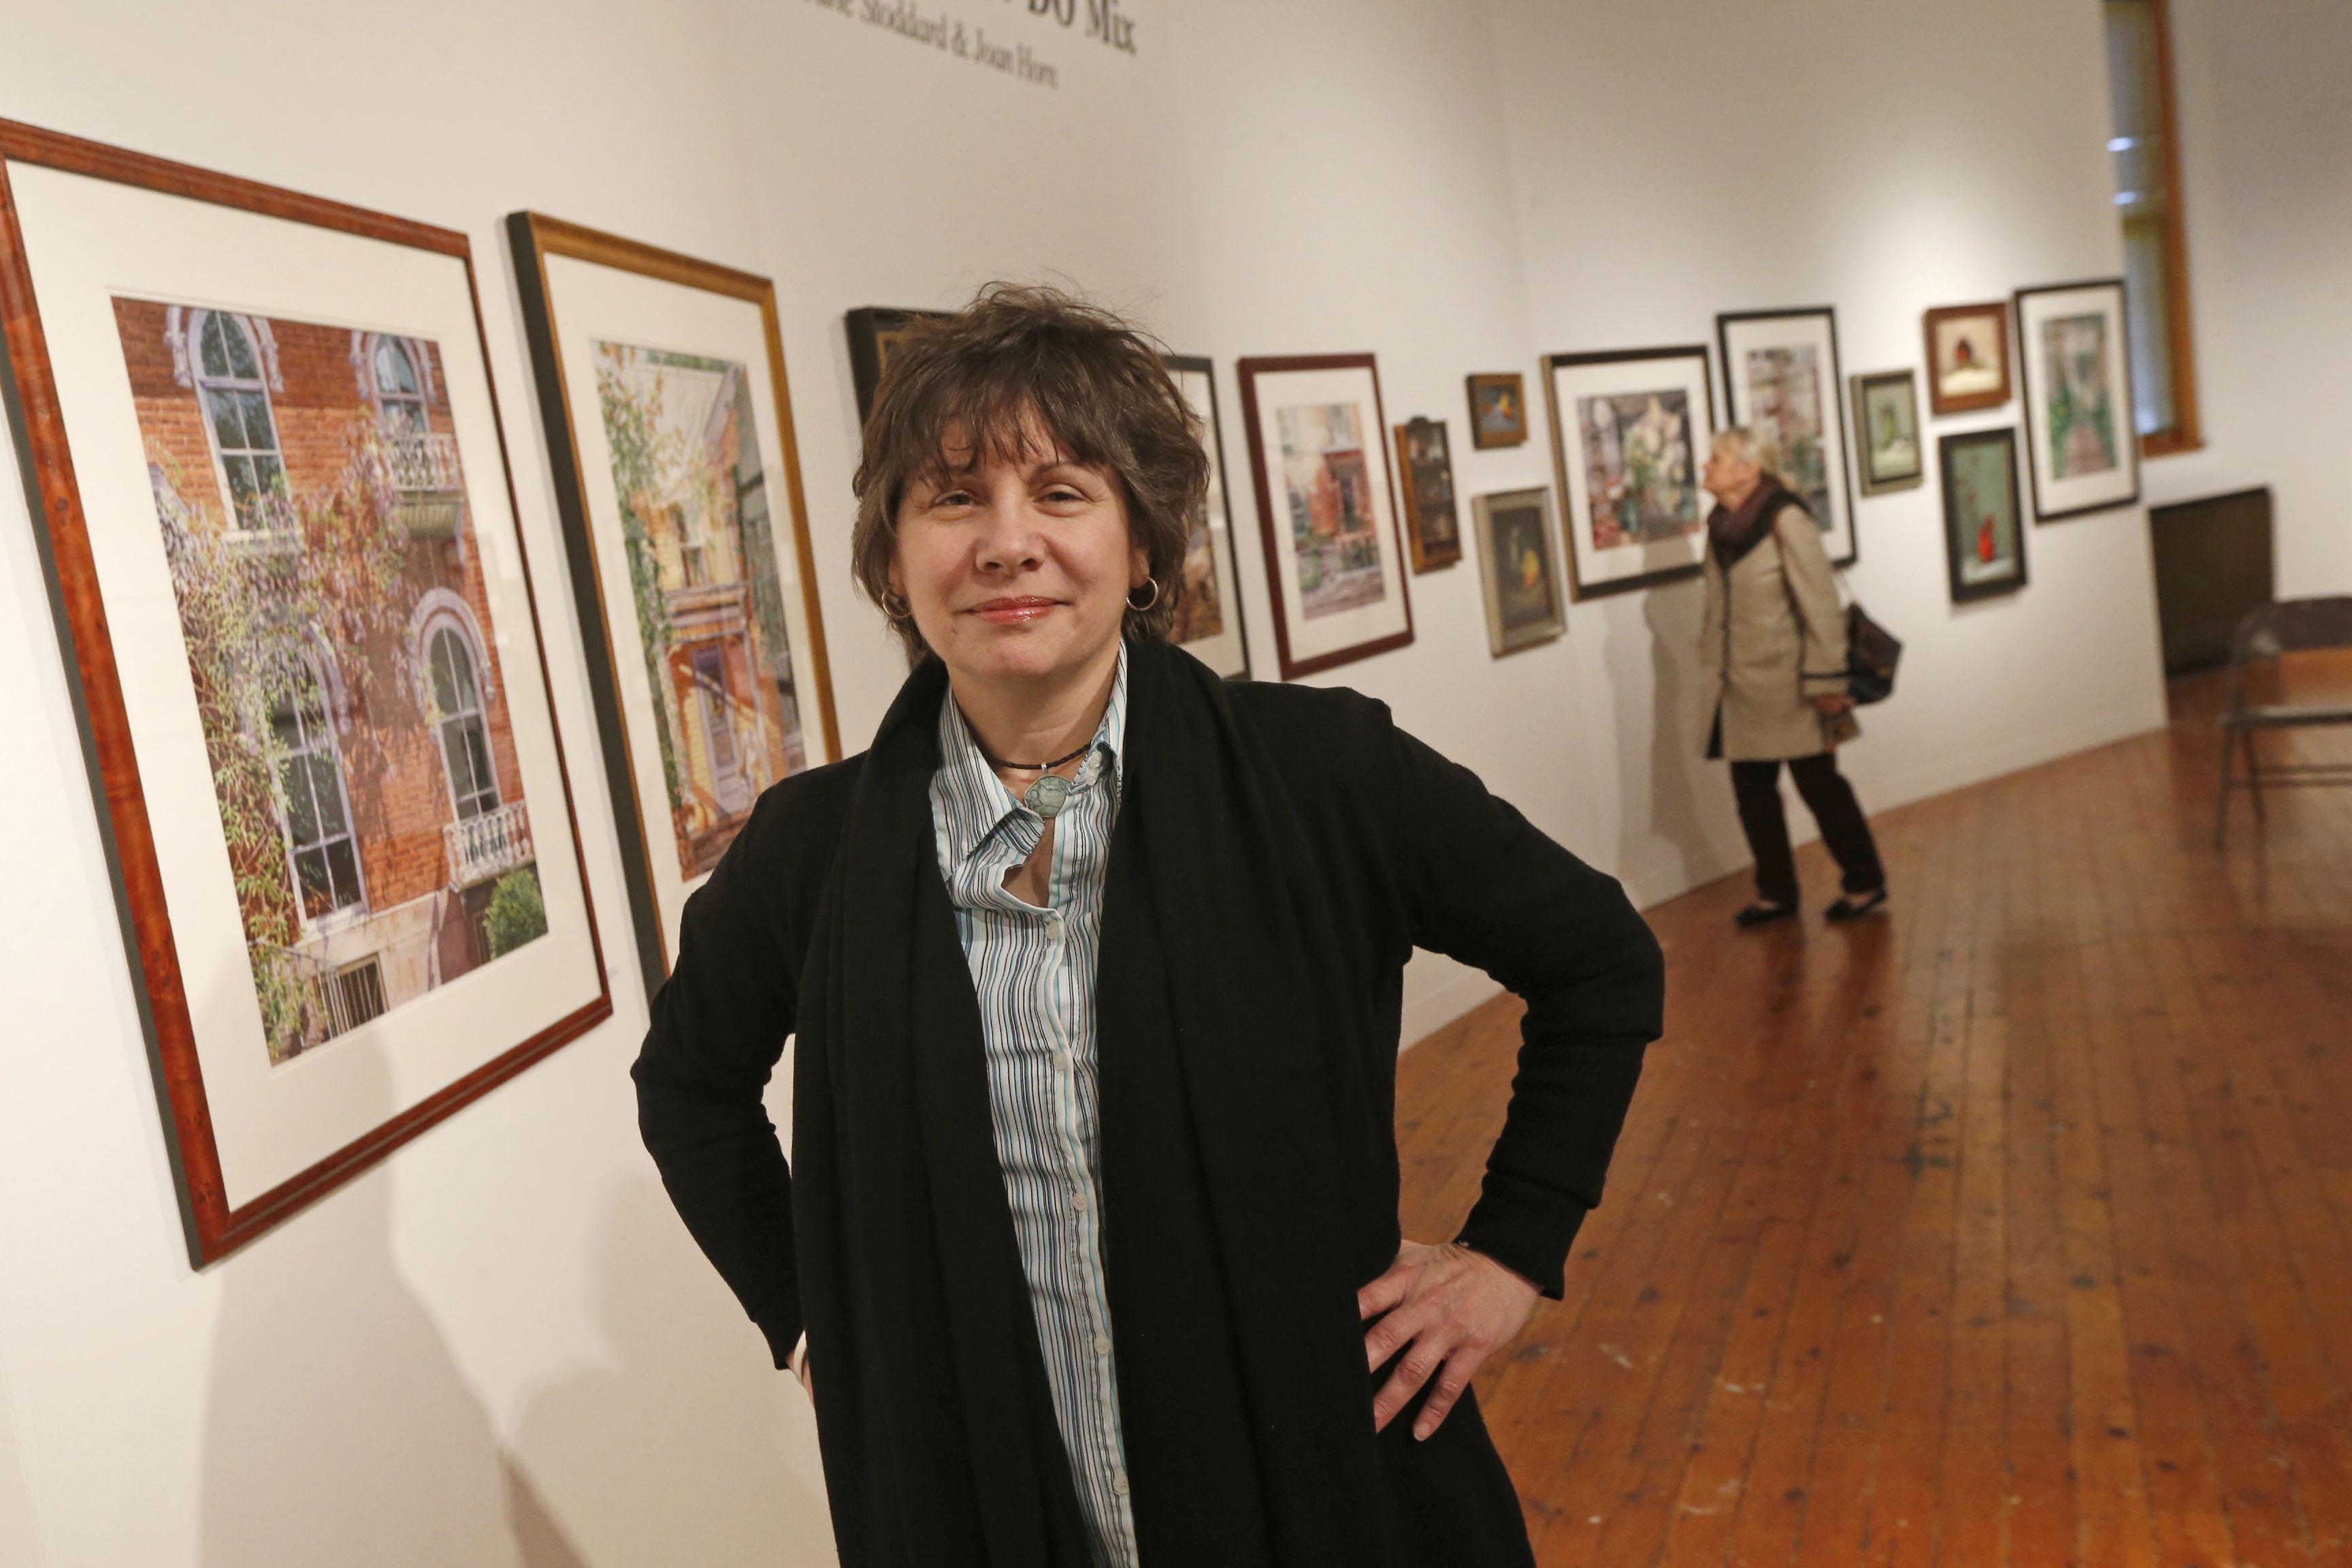 Jennifer Kursten, program coordinator at Carnegie Art Center, is preparing for the center's 'Art off the Wall' fundraiser on Thursday, Dec. 3, 2016. She was photographed Nov. 19 in the center.  (Robert Kirkham/Buffalo News)